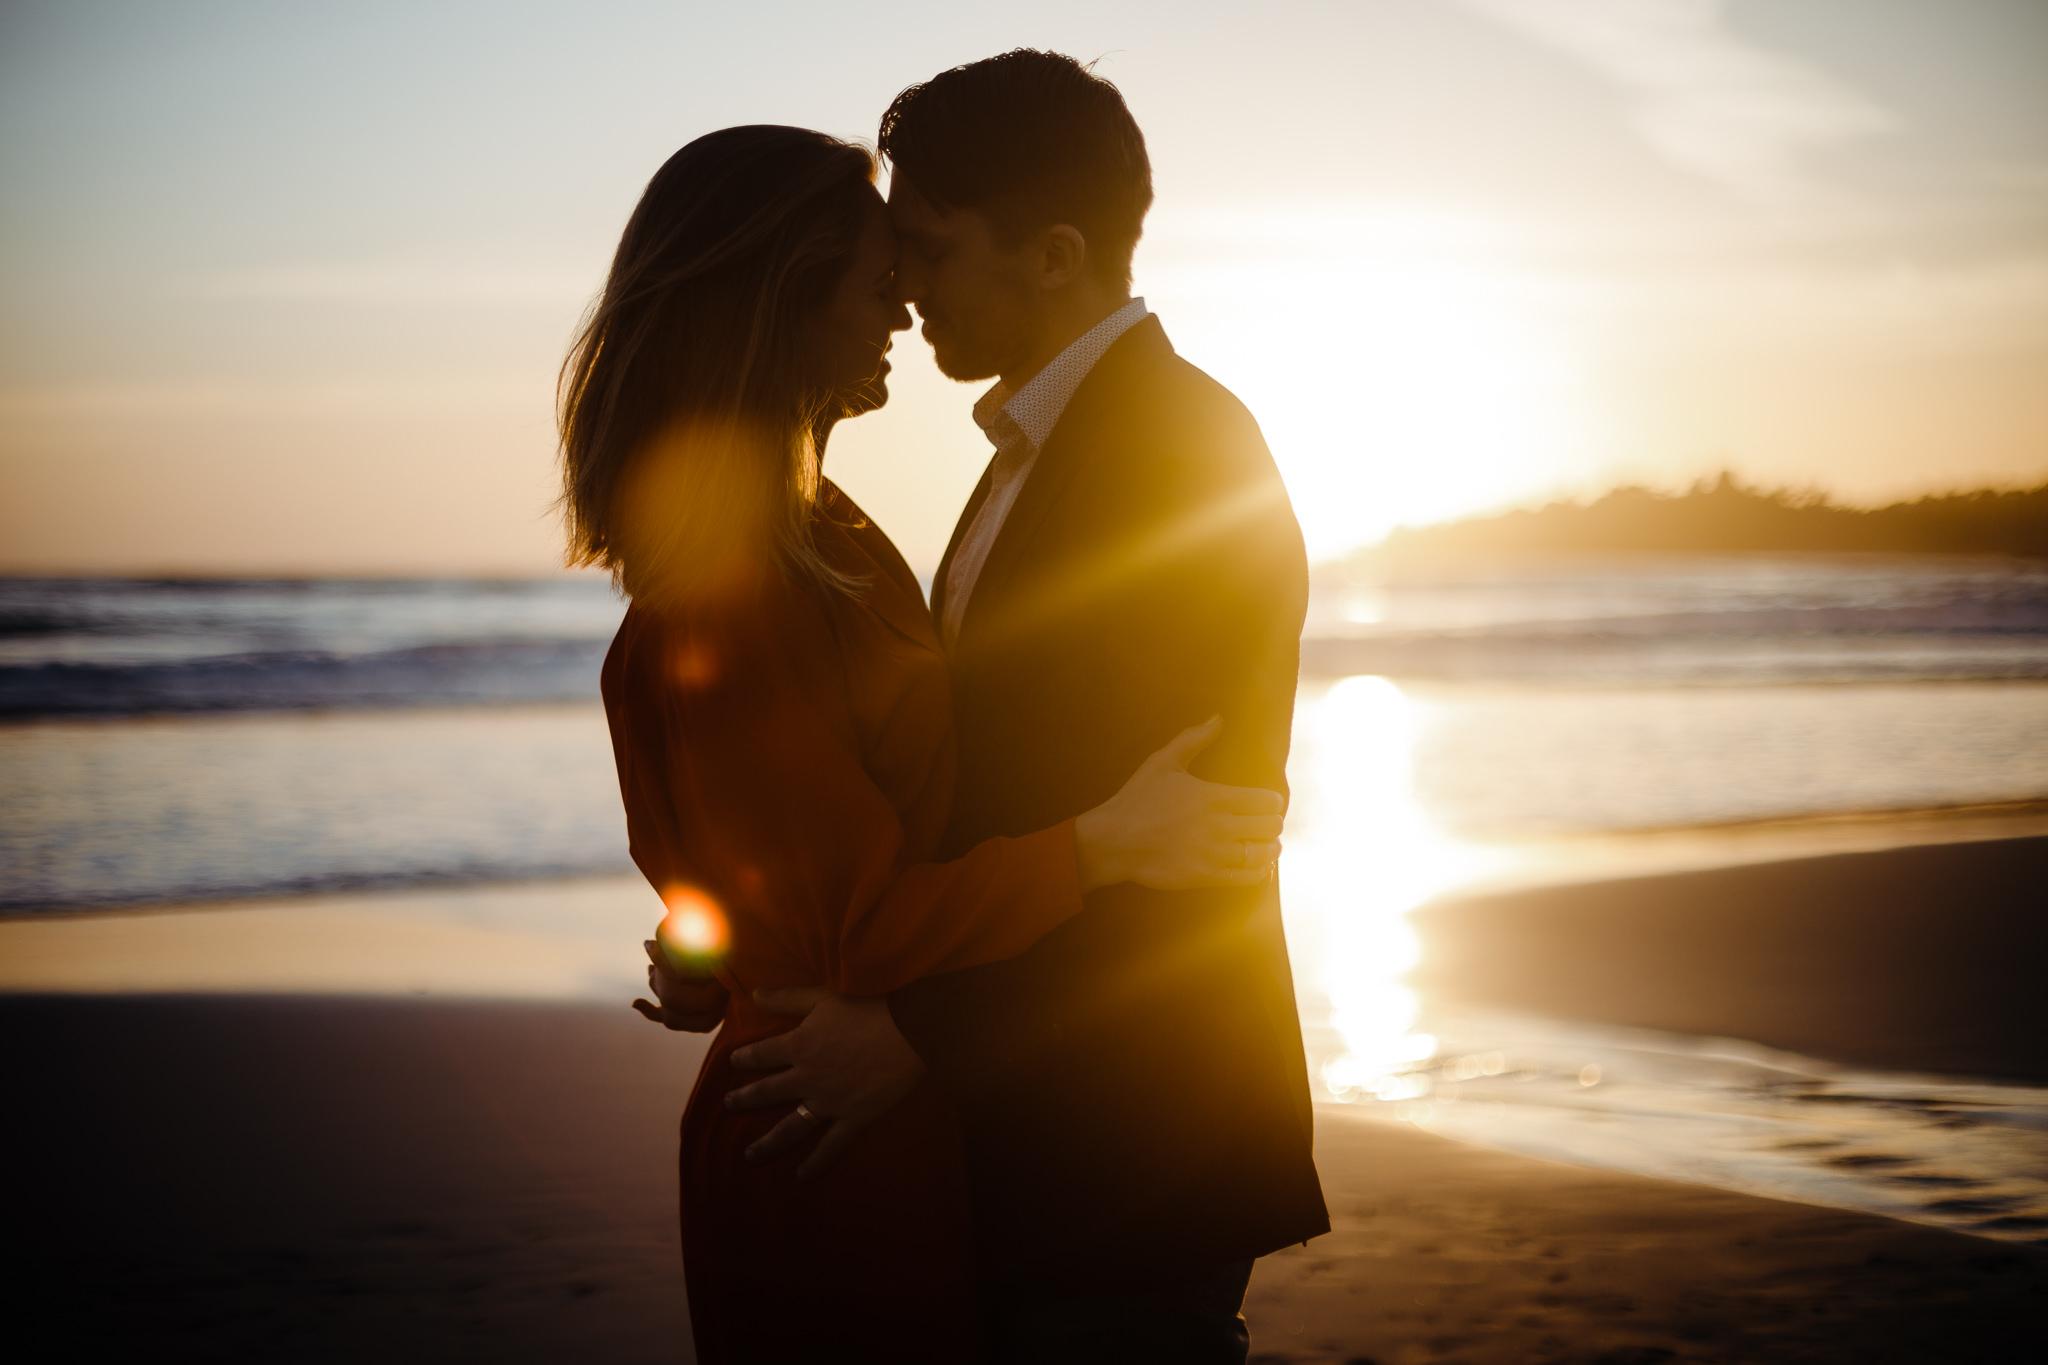 Archer Inspired Photography Carmel Beach California Wedding Engagement Lifestyle Anniversary Natural Light Photographer-79.jpg